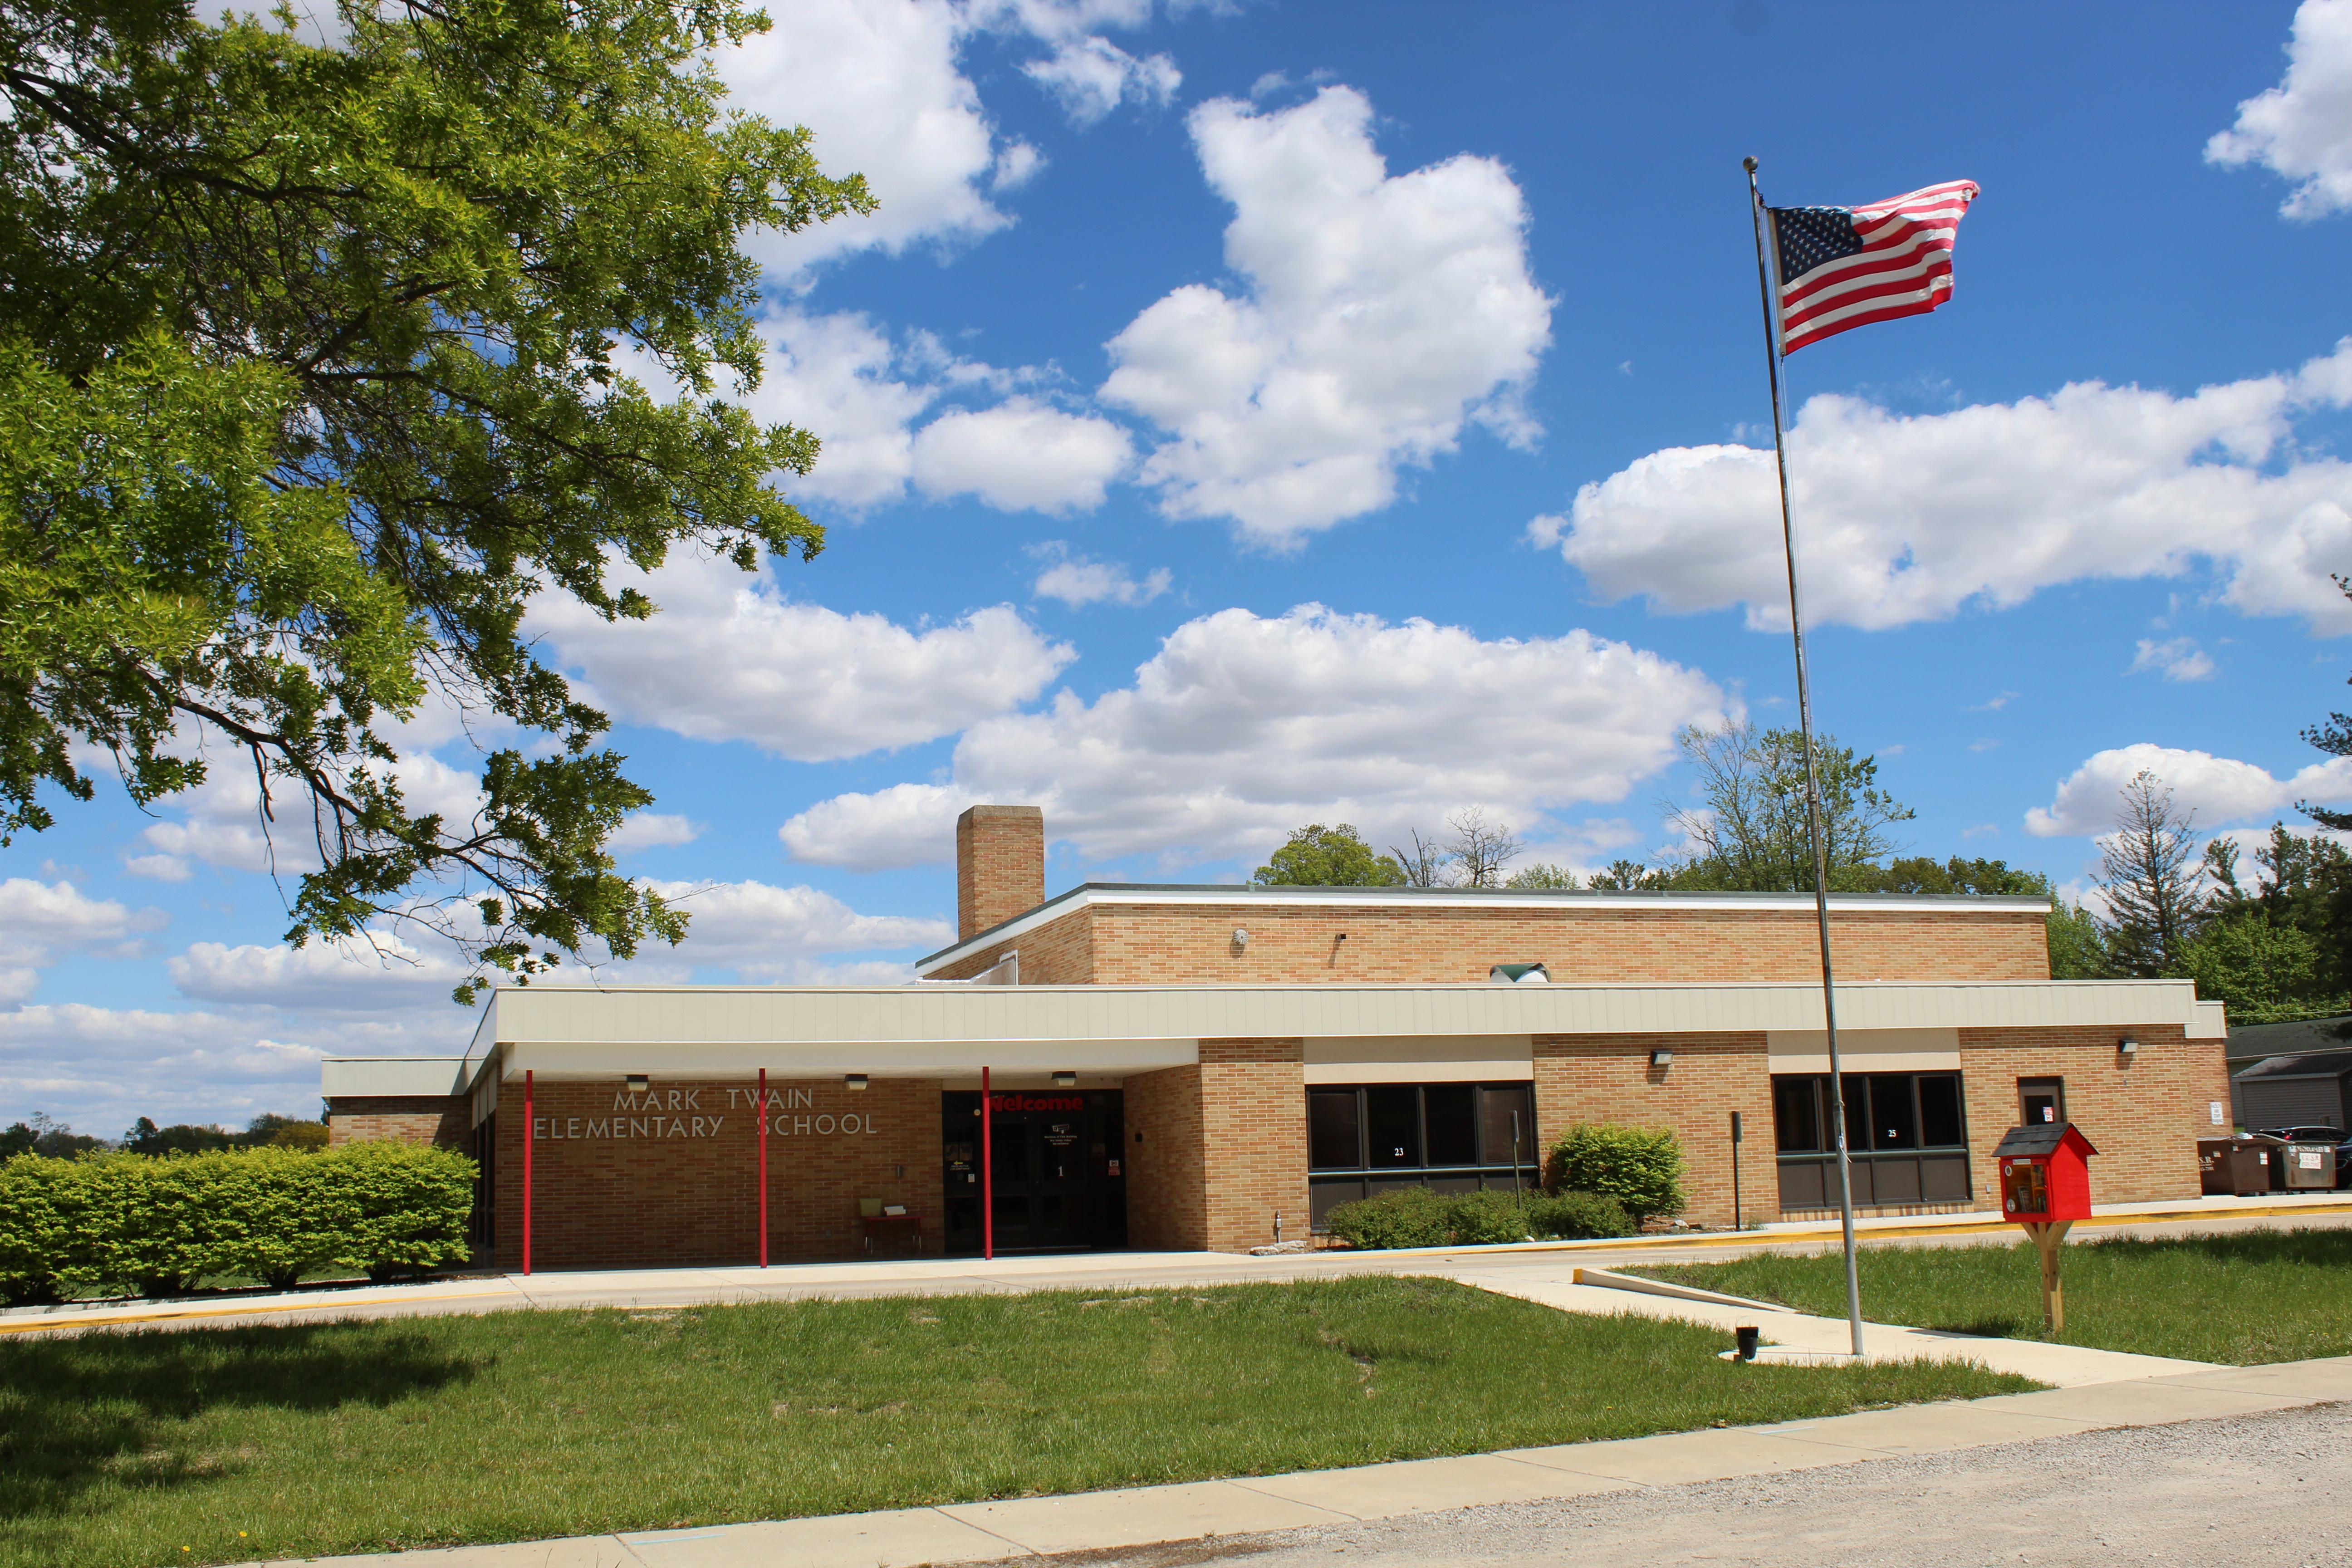 Mark Twain Elementary School